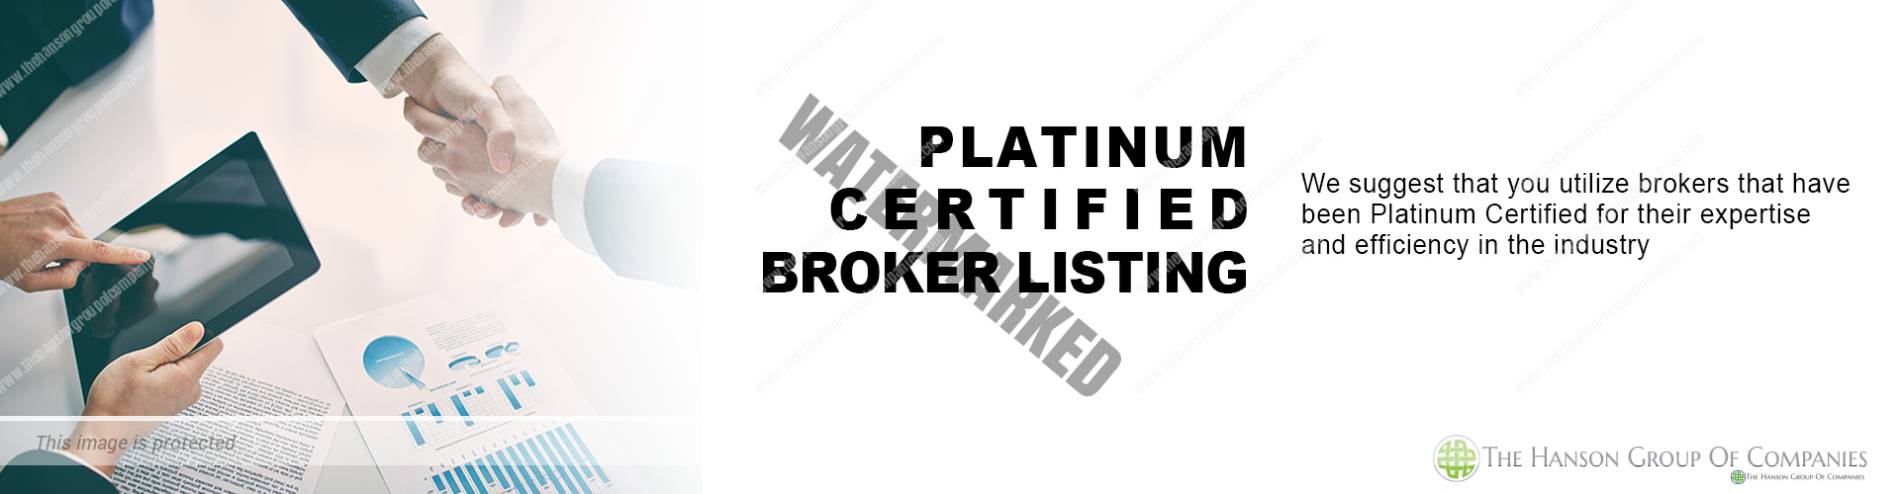 platinum-certified-broker-listing